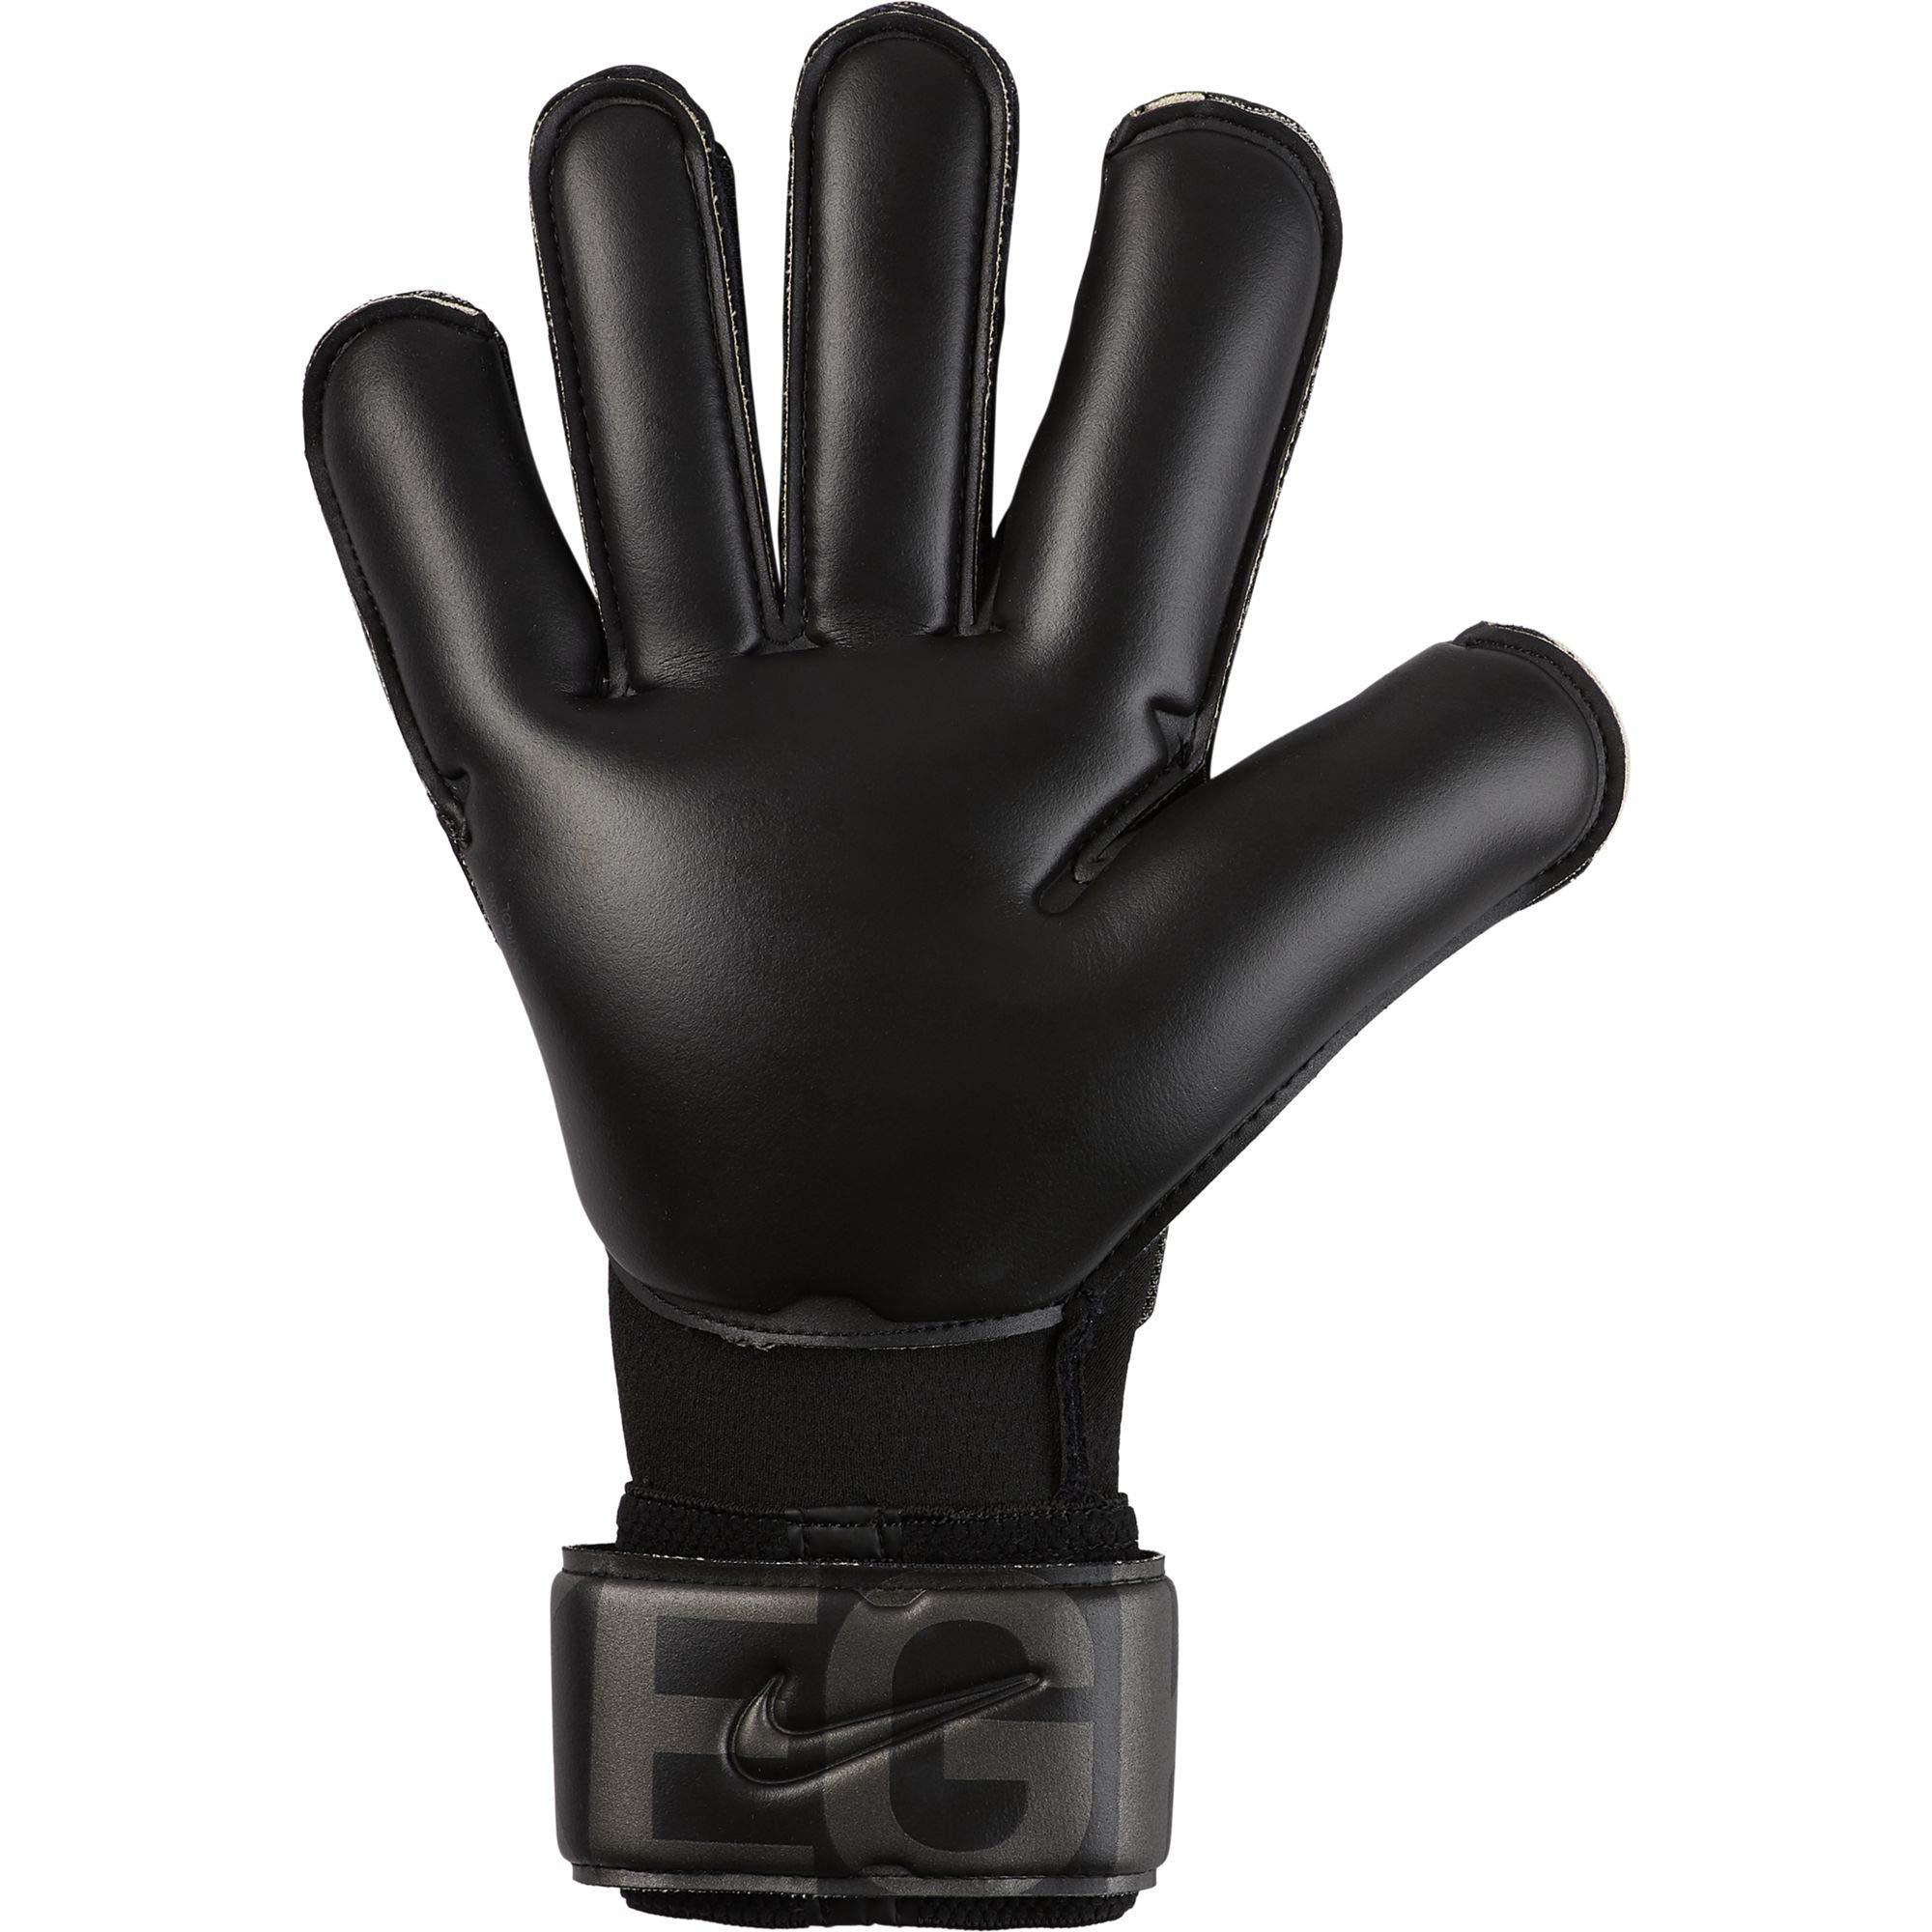 Rezumar creativo farmacéutico  Nike Vapor Grip 3 Goalkeeper Soccer Gloves (10, Black) : Sports & Outdoors  - Amazon.com